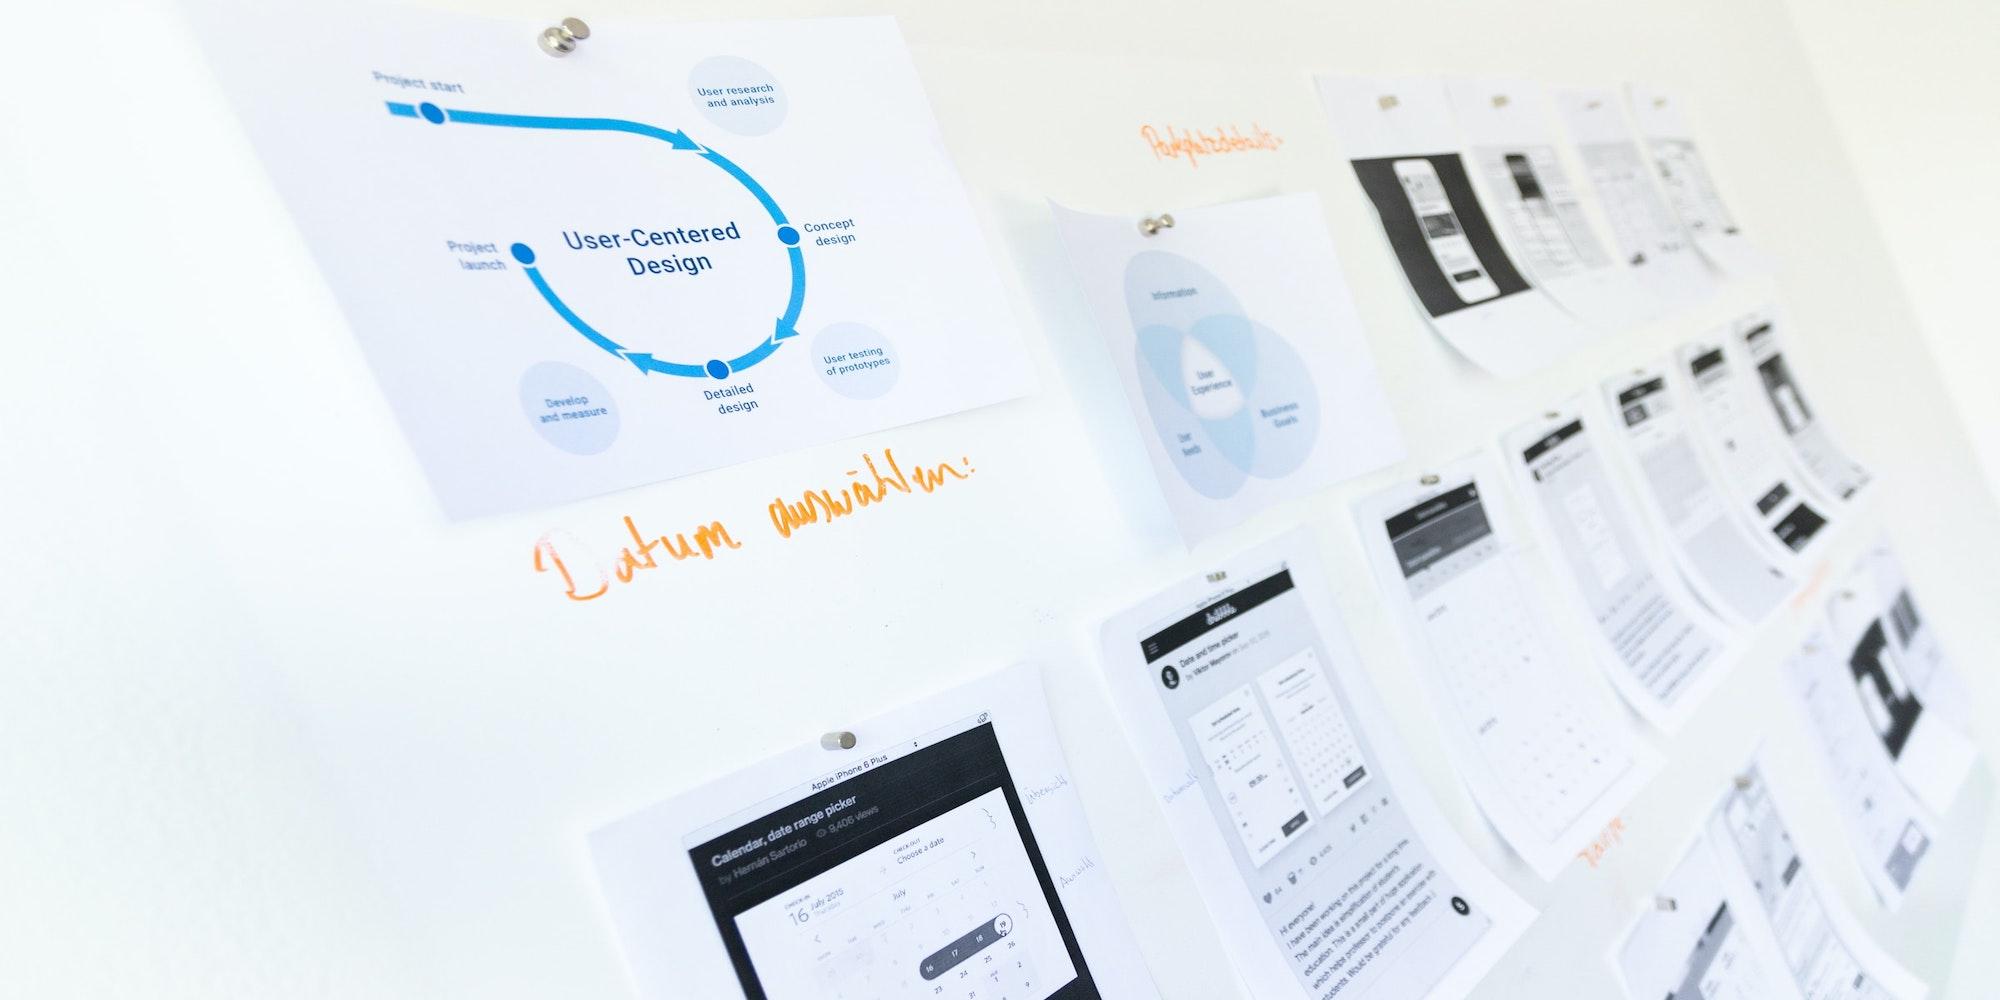 Miro whiteboard: TTT's go-to online collaboration tool